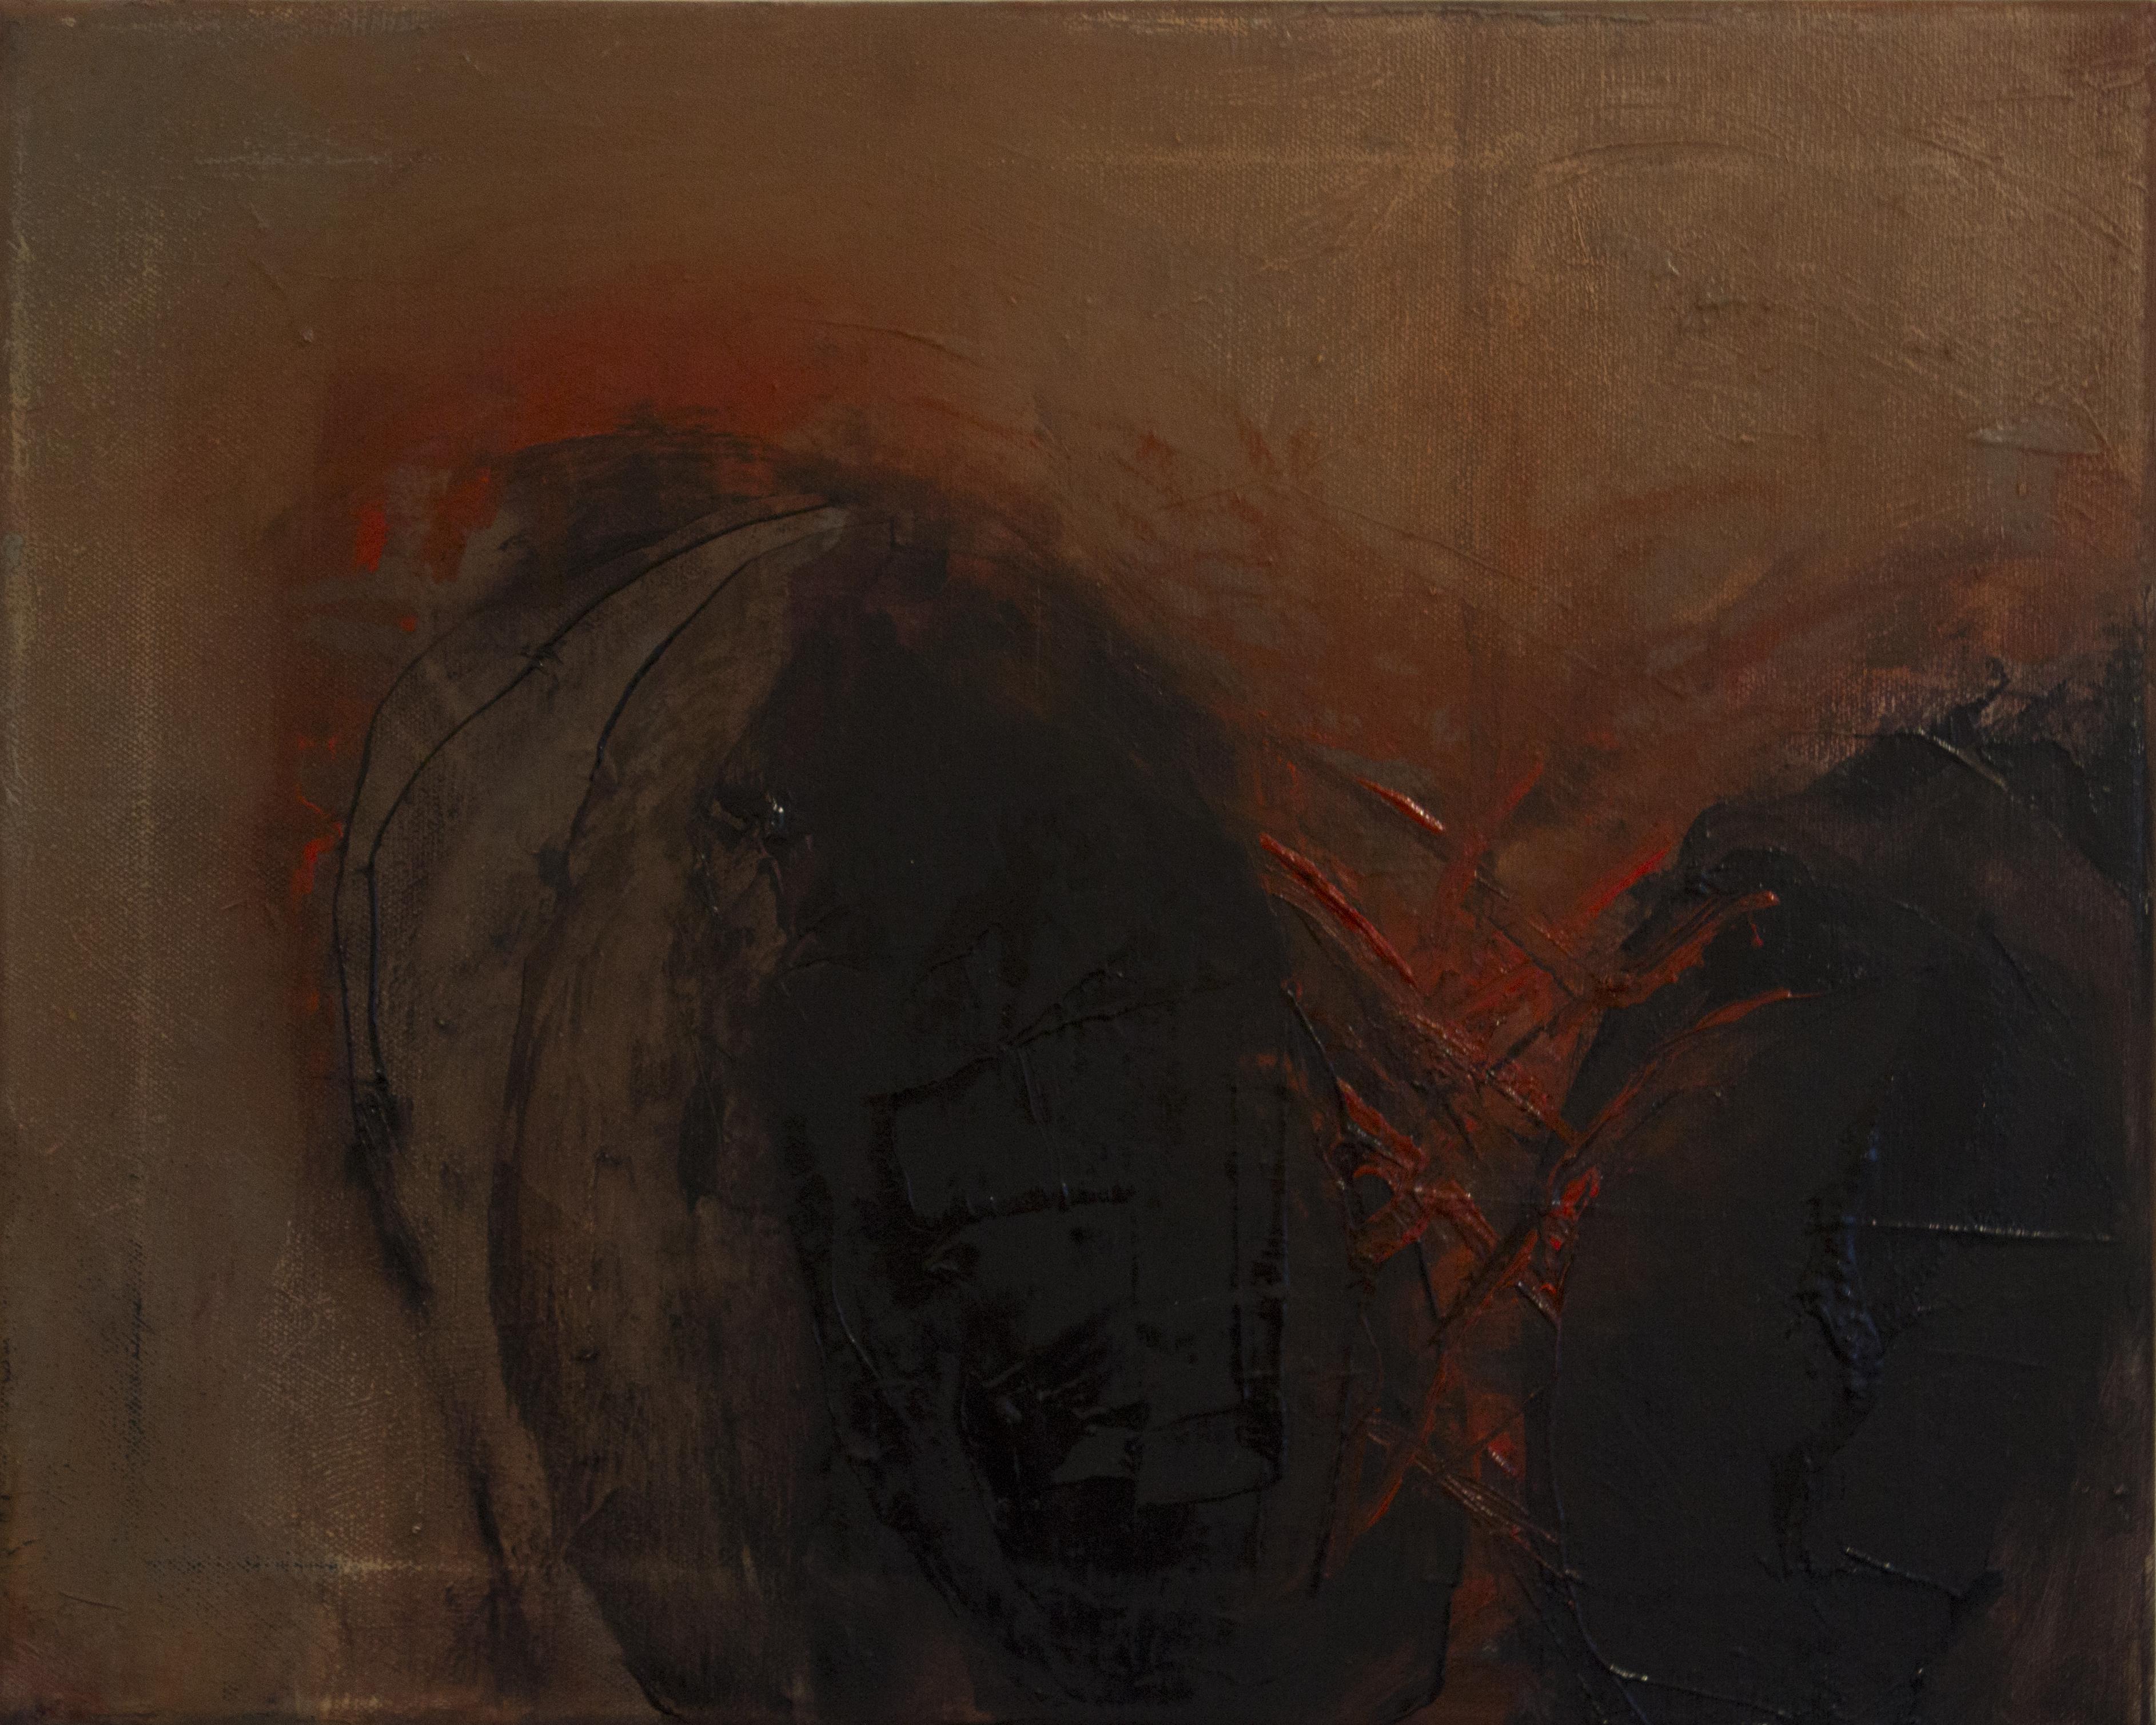 Jules Allan - Untitled, 41cm x 51cm, oil on canvas